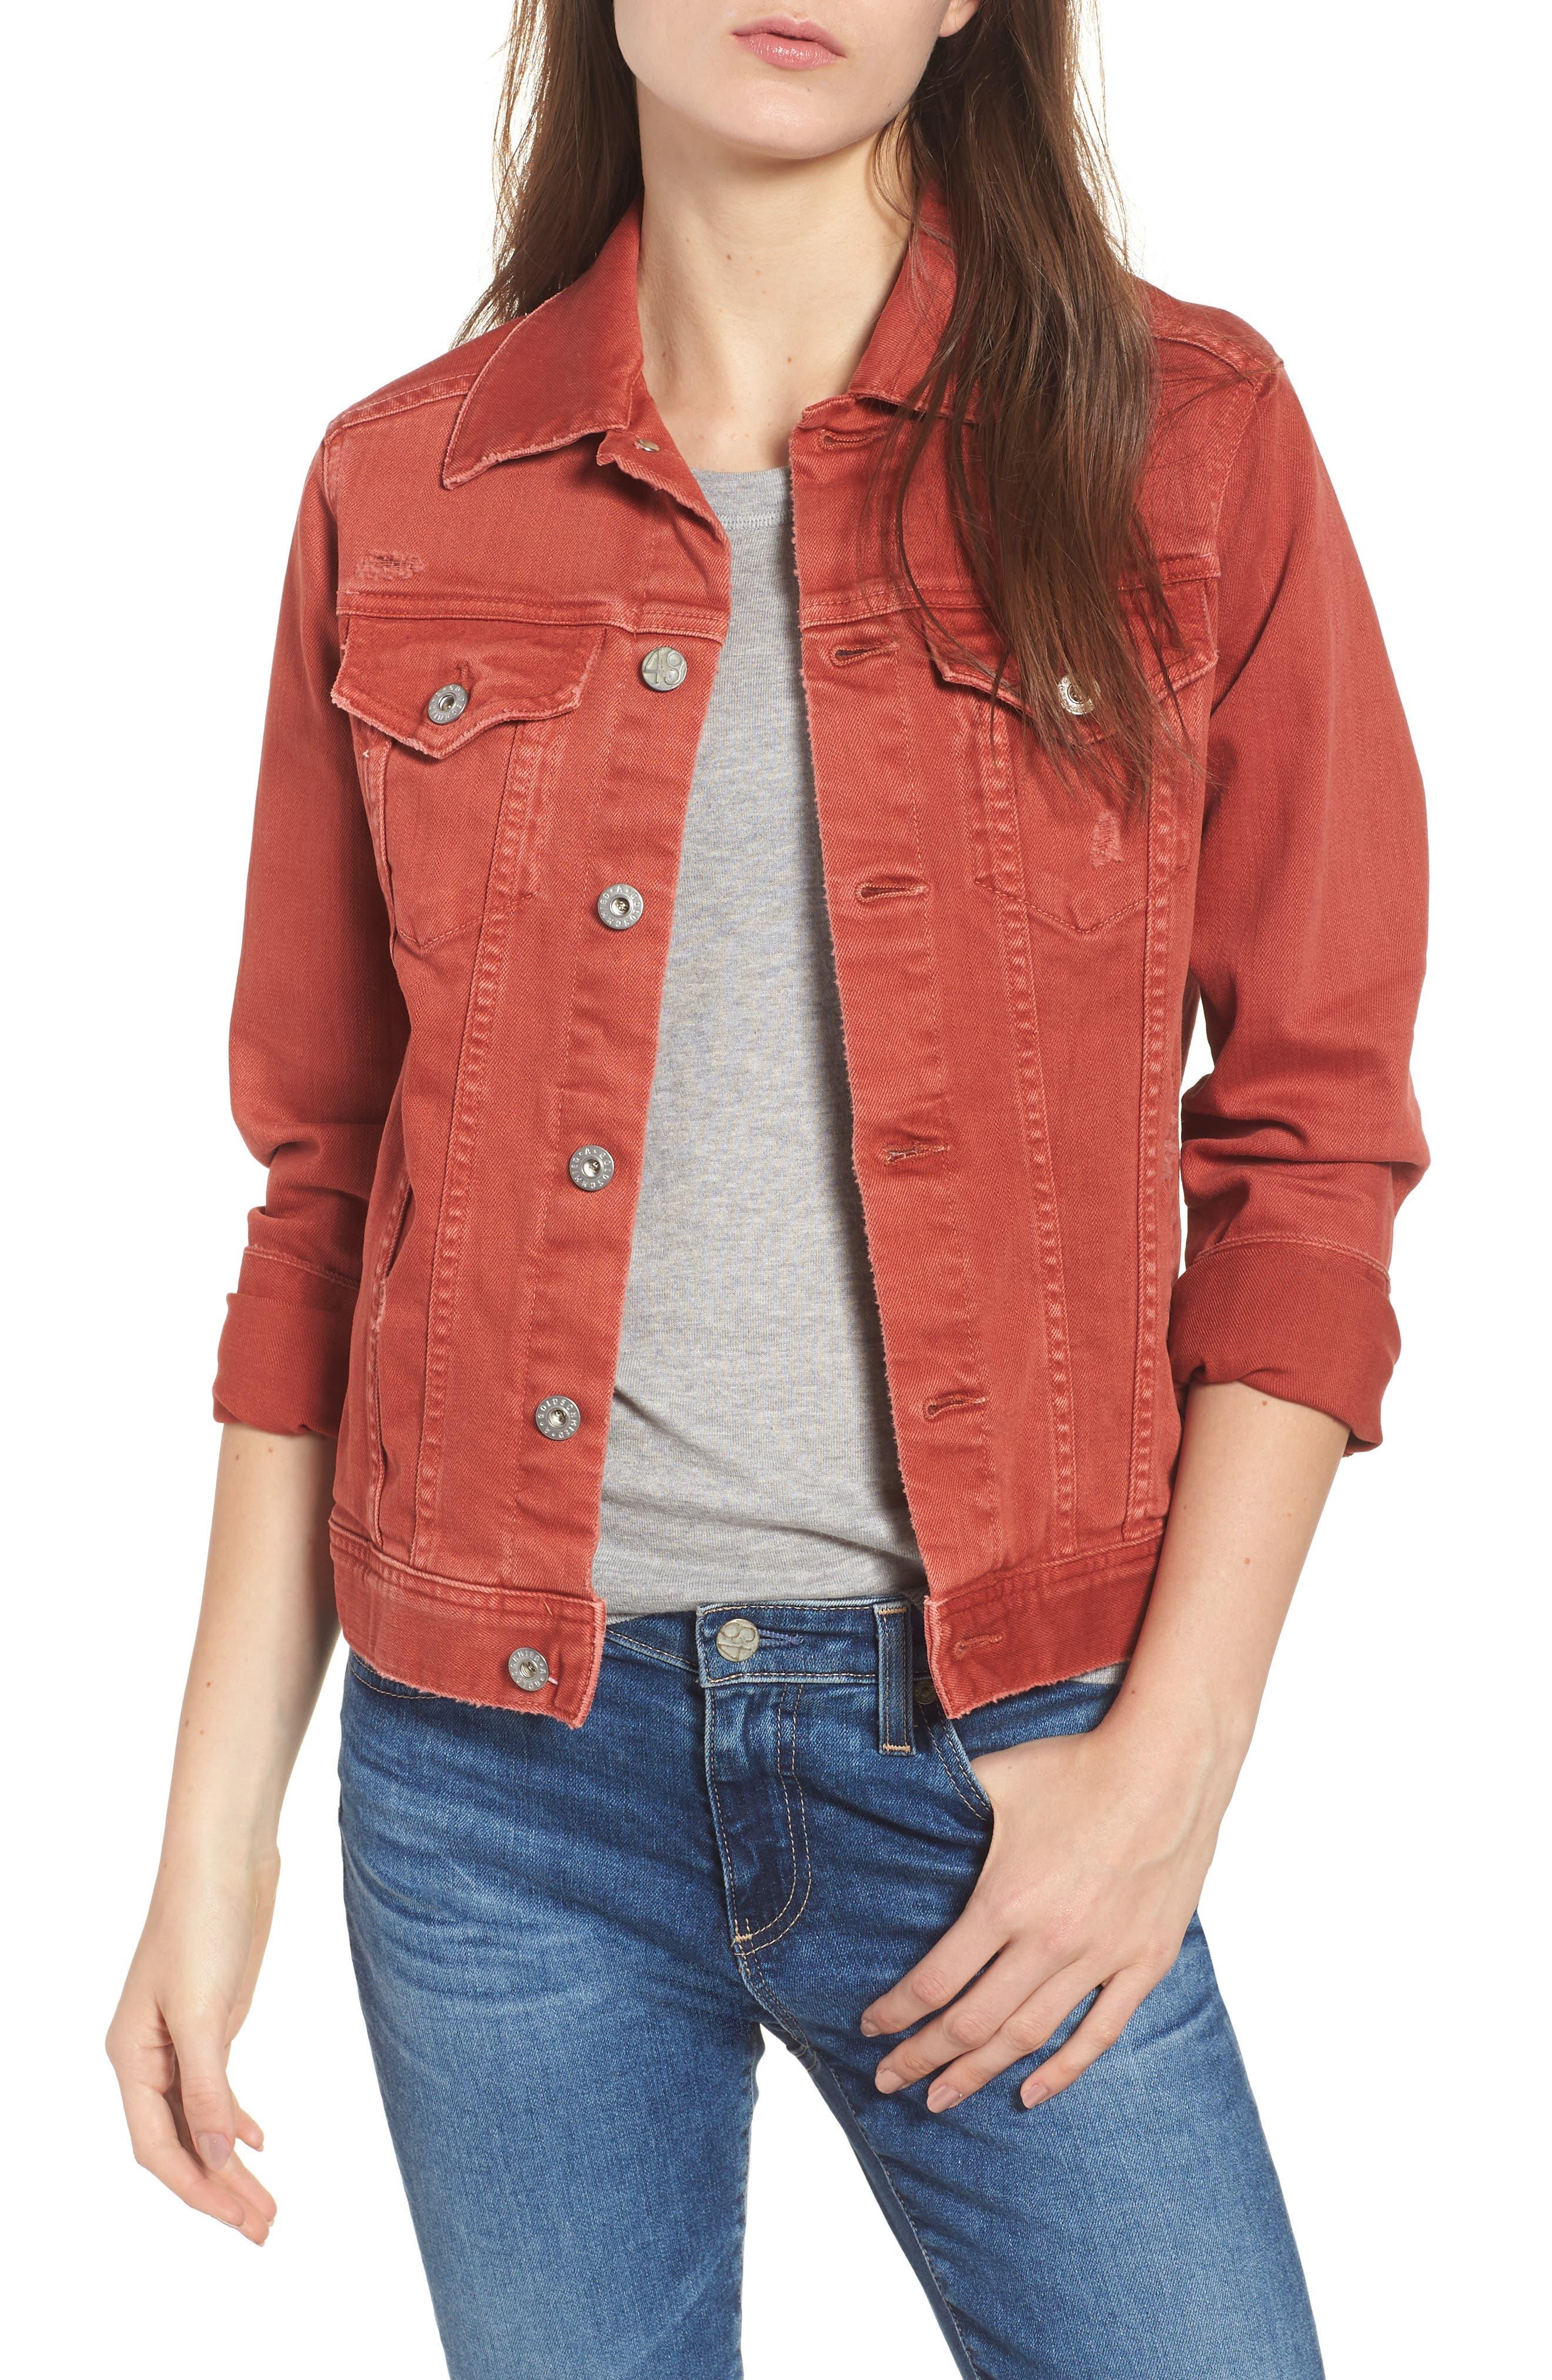 Mya Denim Jacket,                             Main thumbnail 1, color,                             10 Years Remedy Firebrick